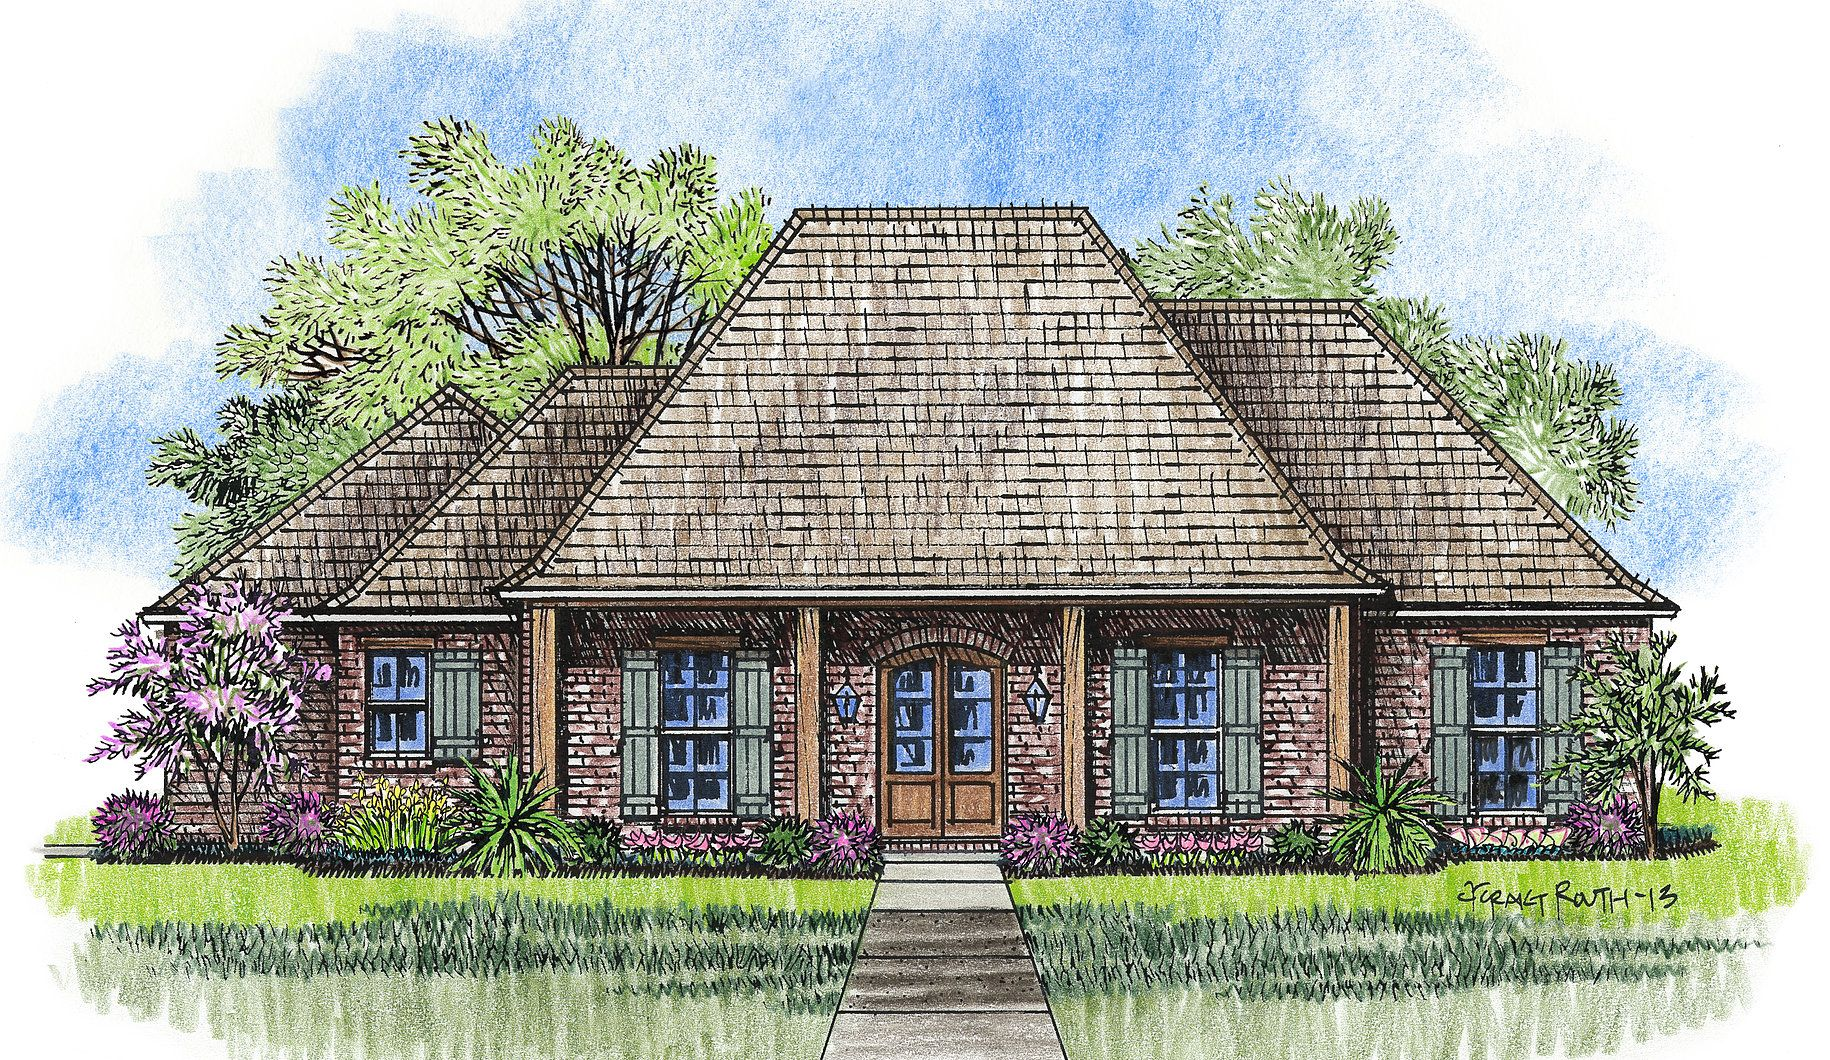 Madden Home Design - The Elmwood